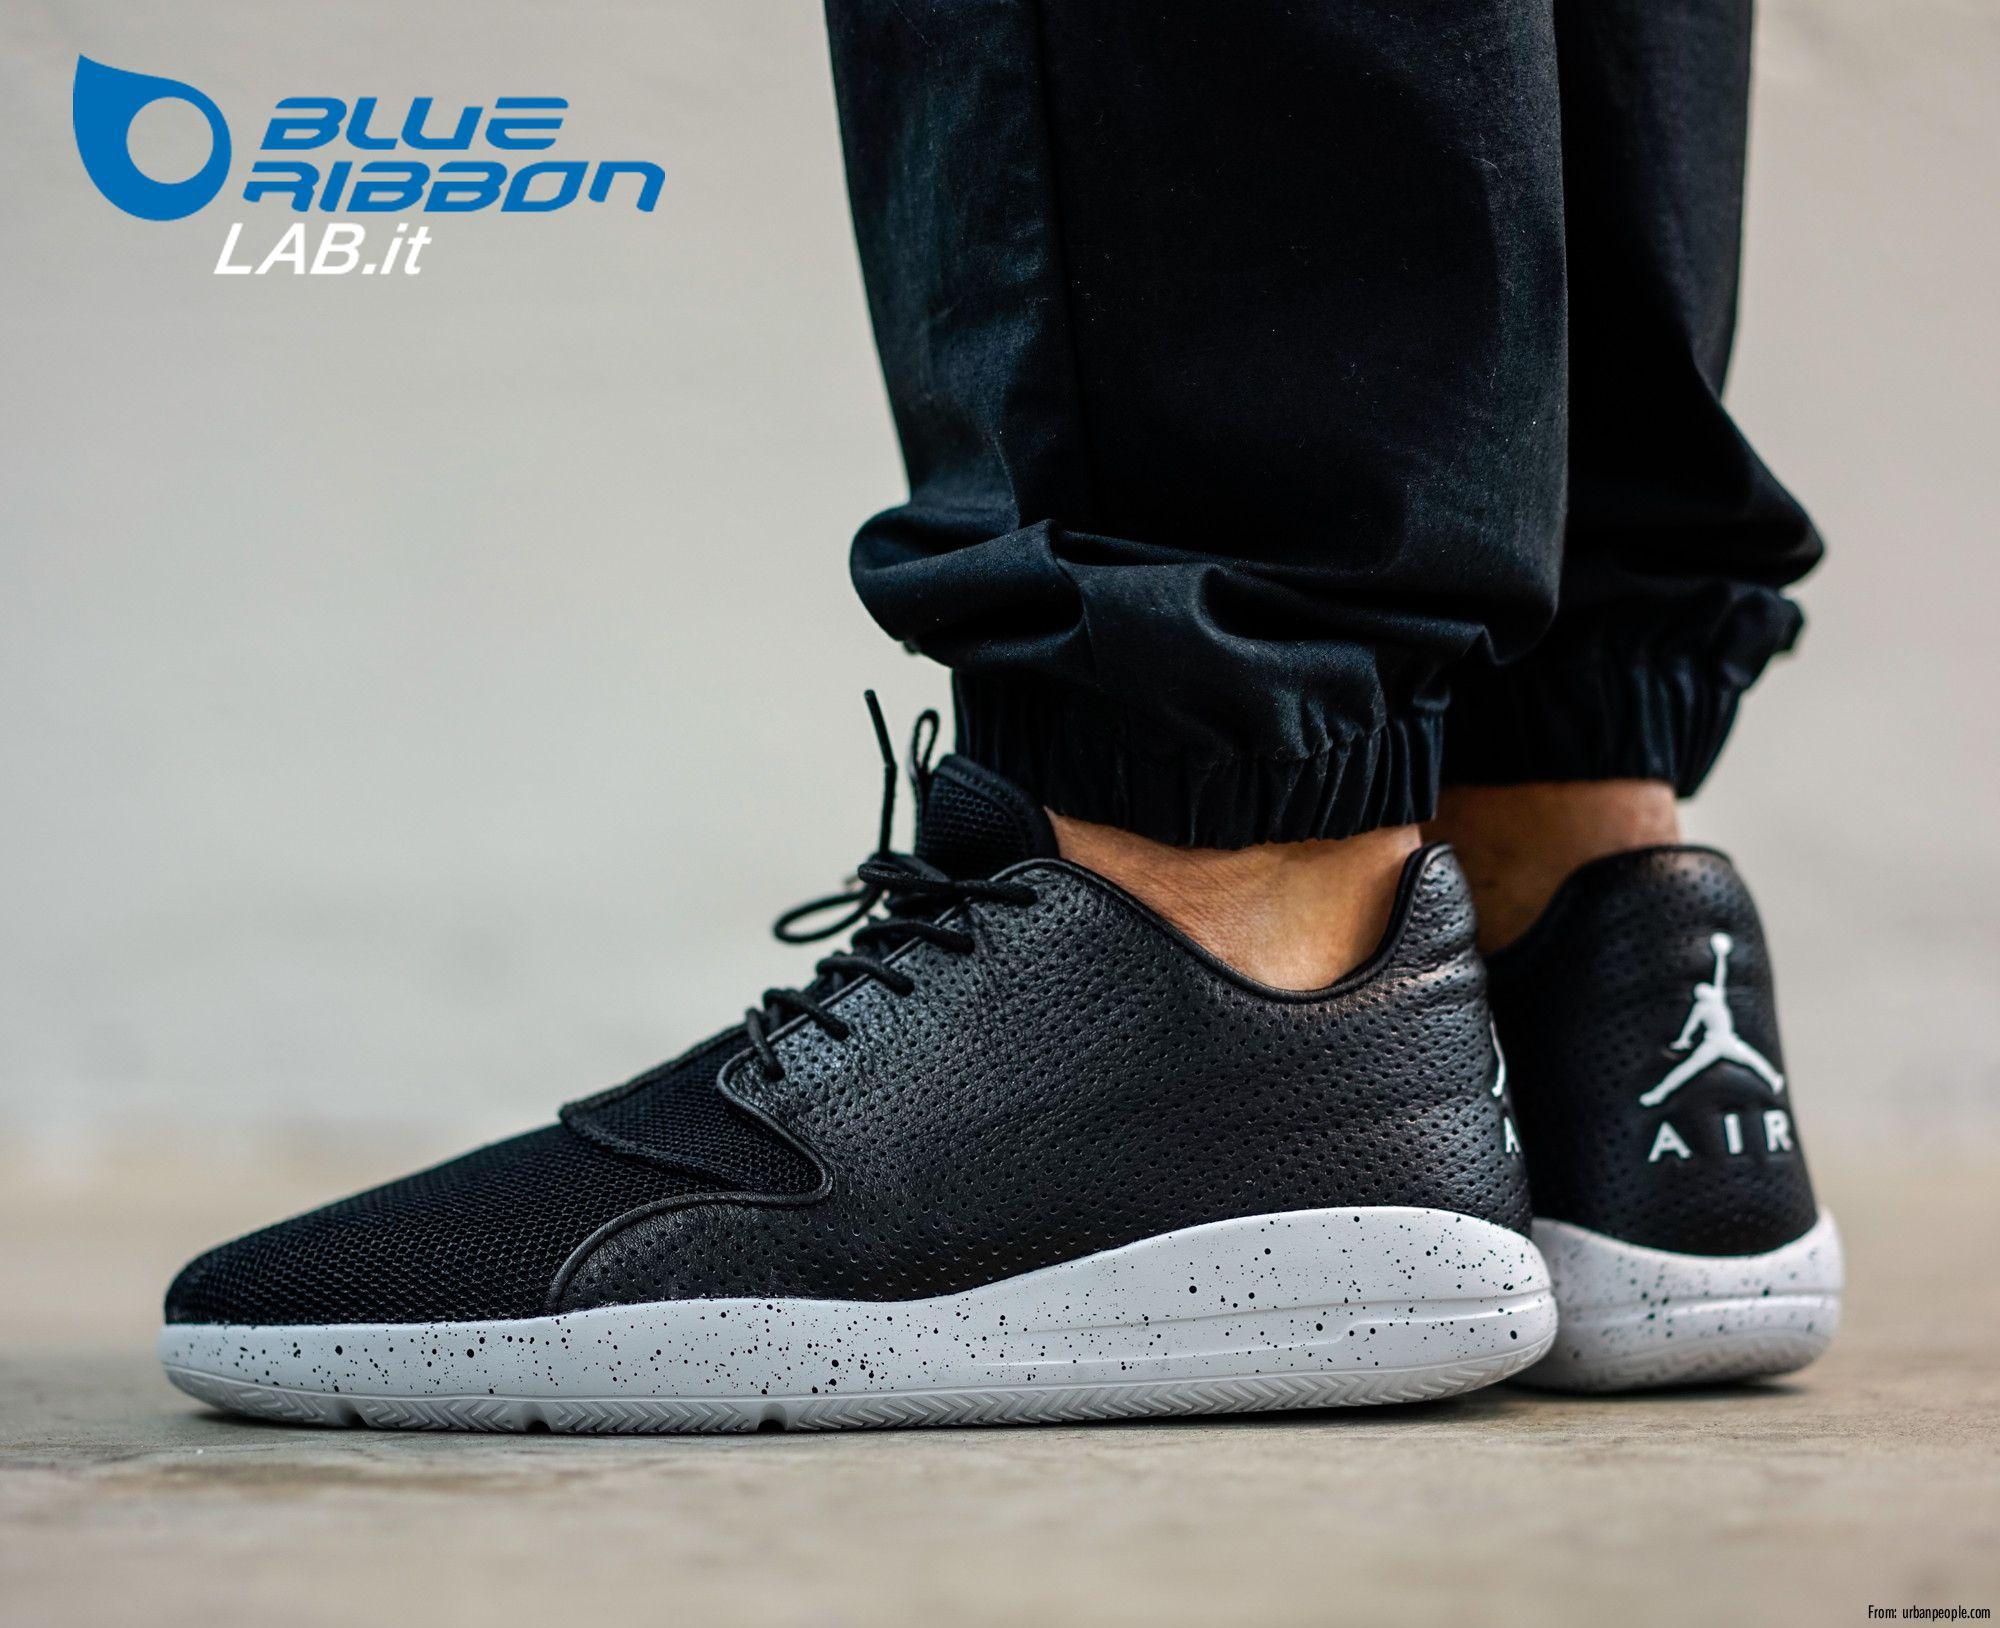 nike air jordan eclipse mens basketball shoes